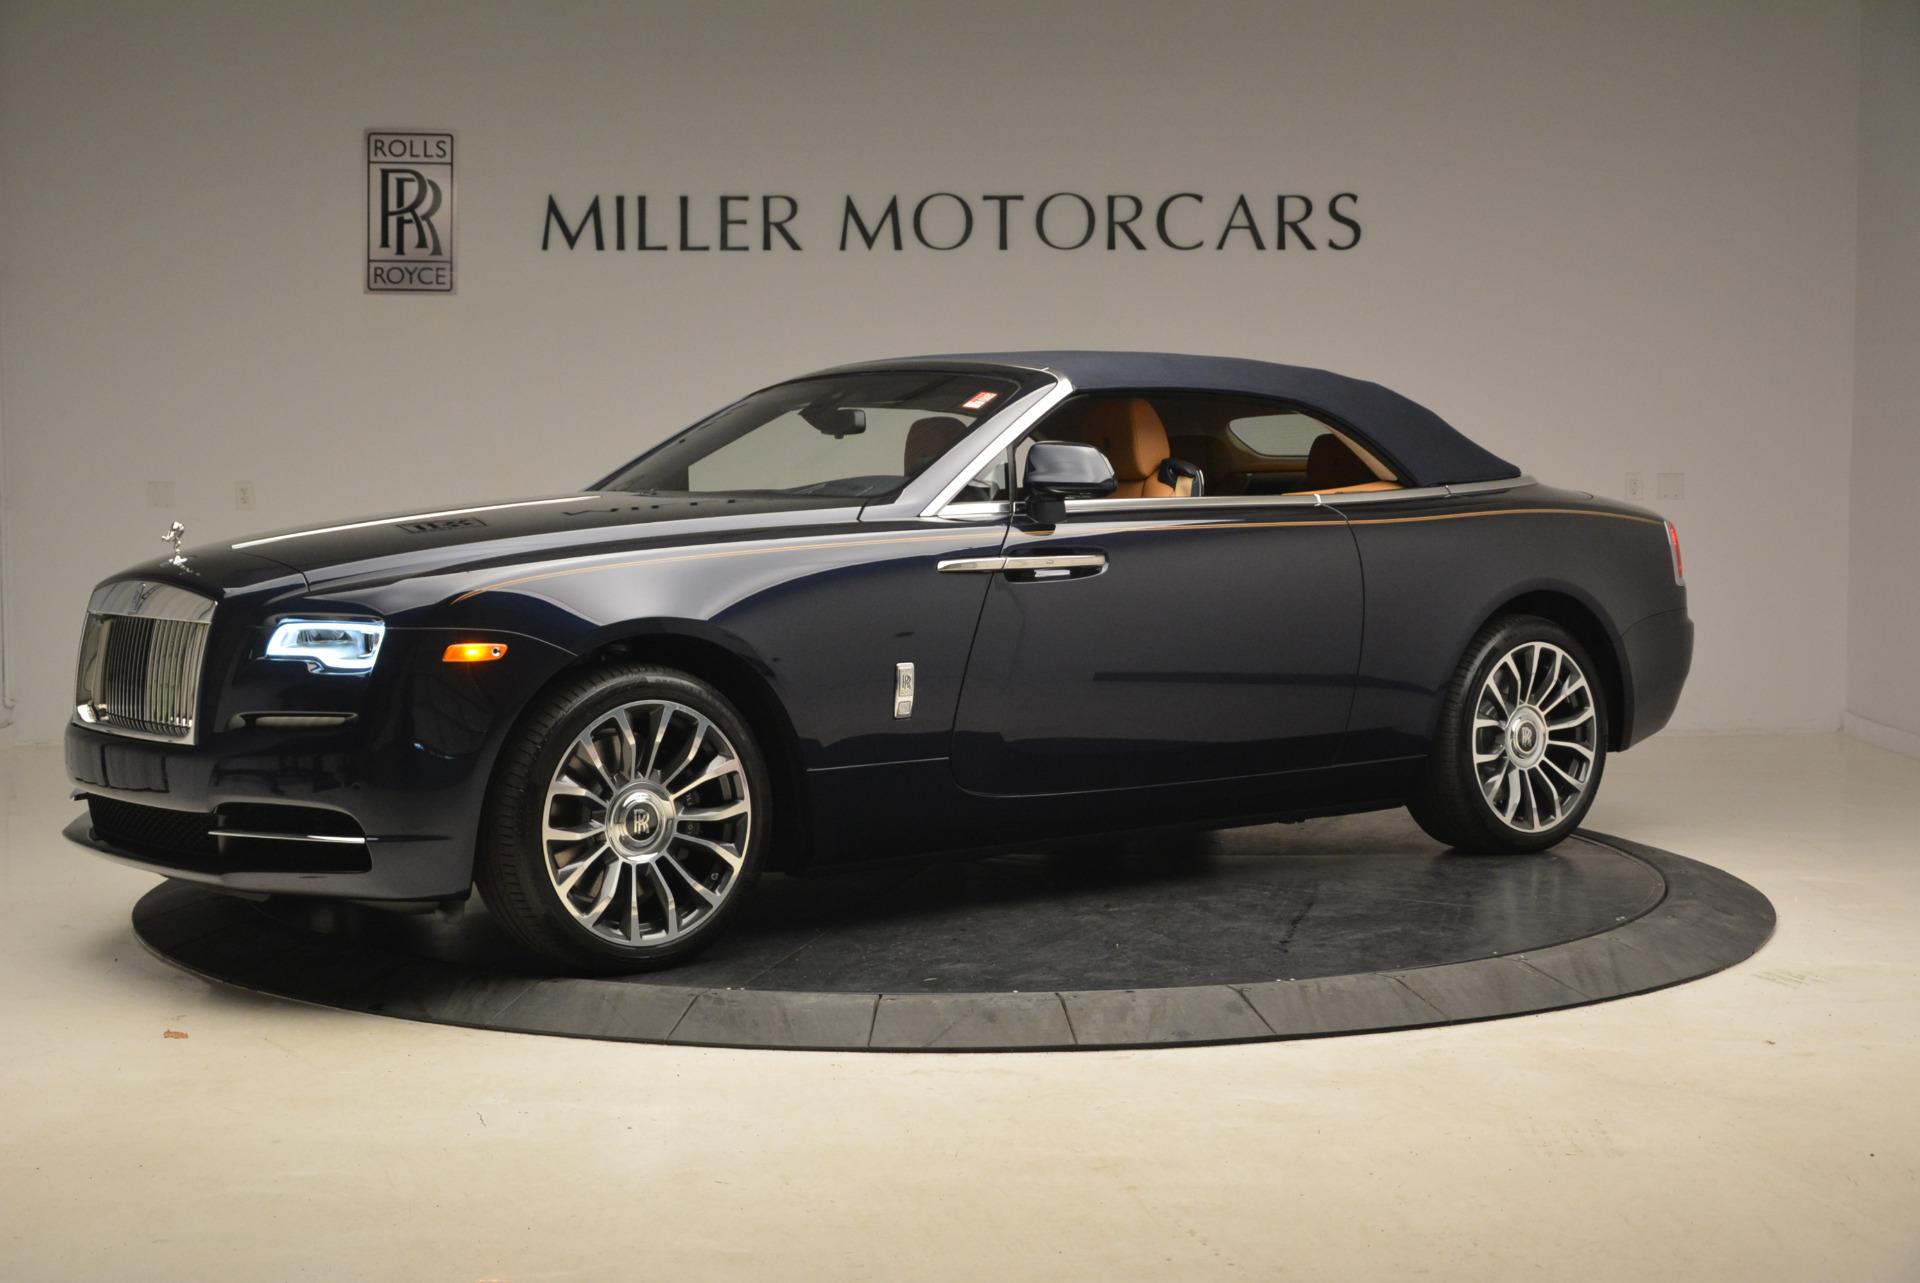 New 2018 Rolls-Royce Dawn  For Sale In Greenwich, CT 2118_p14